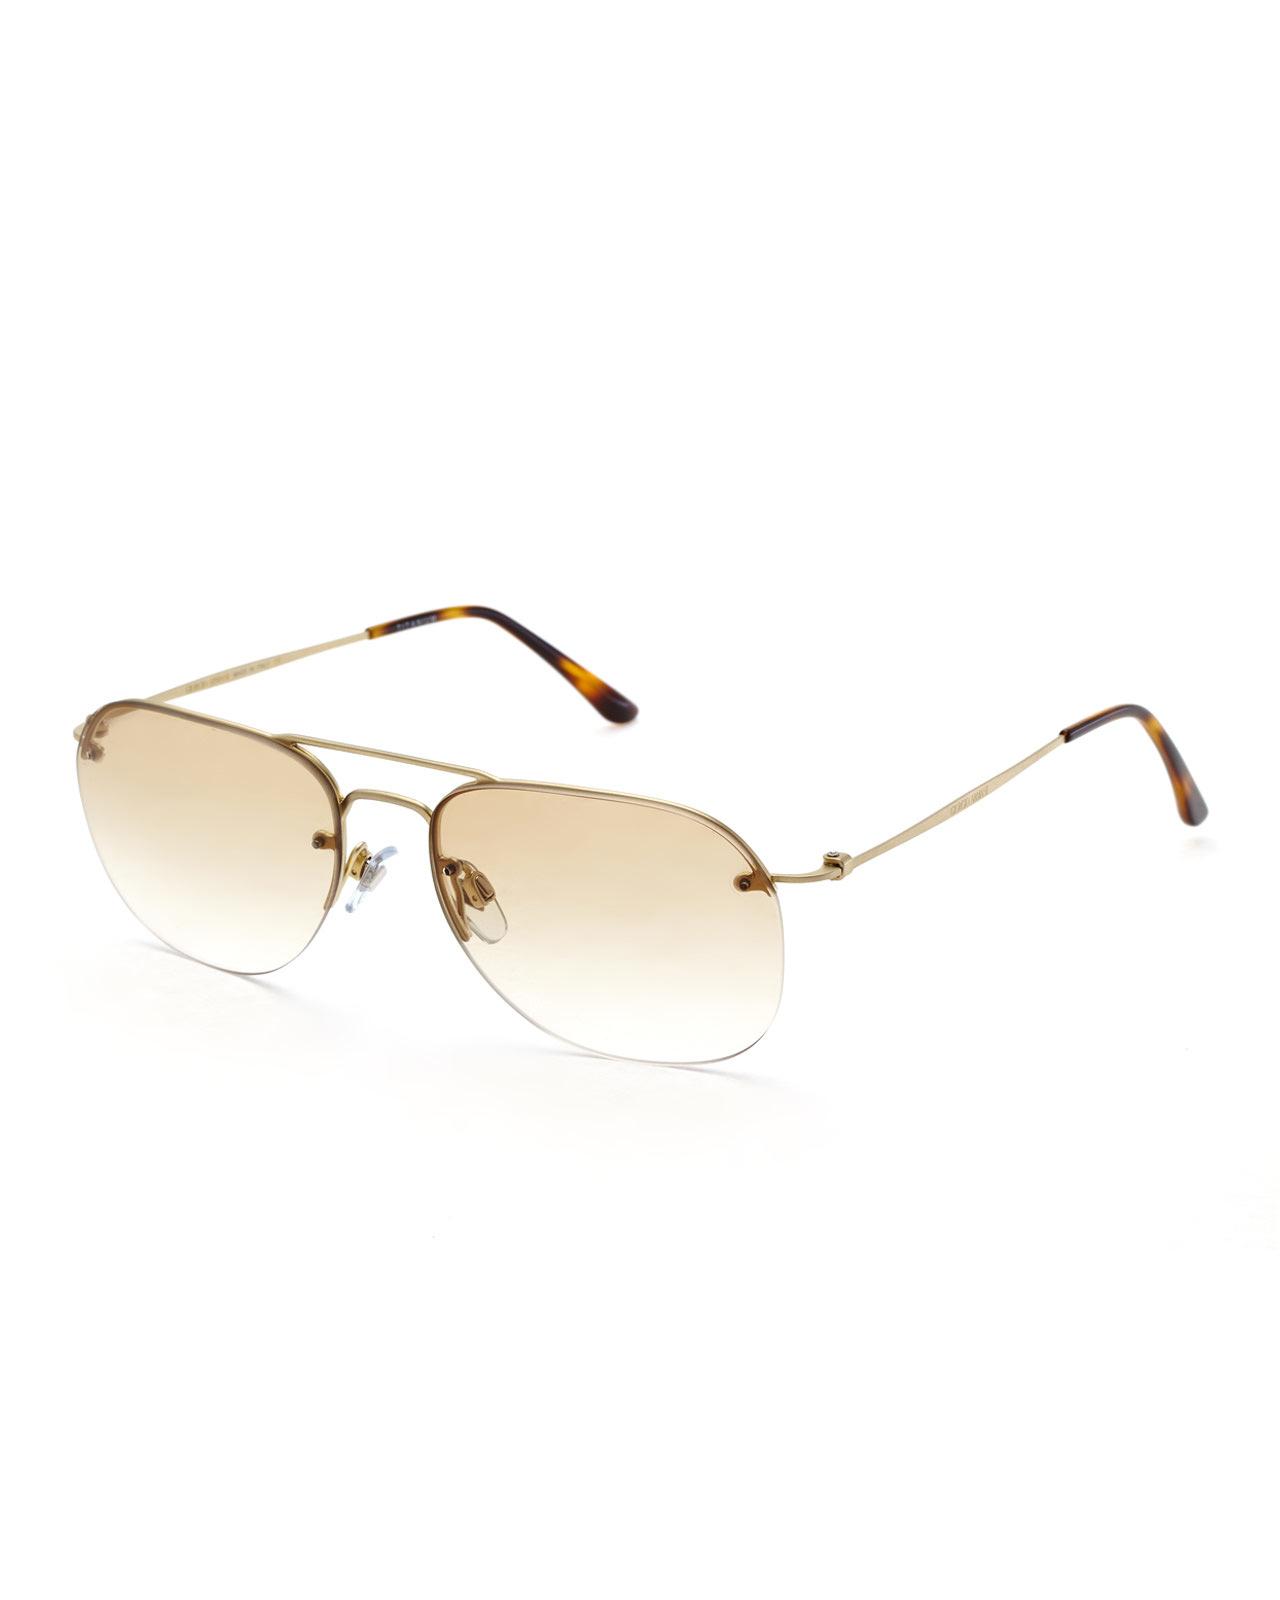 9bd66a0b35a3b Giorgio Armani Ar6004 Gold-Tone Rimless Aviator Sunglasses in ...